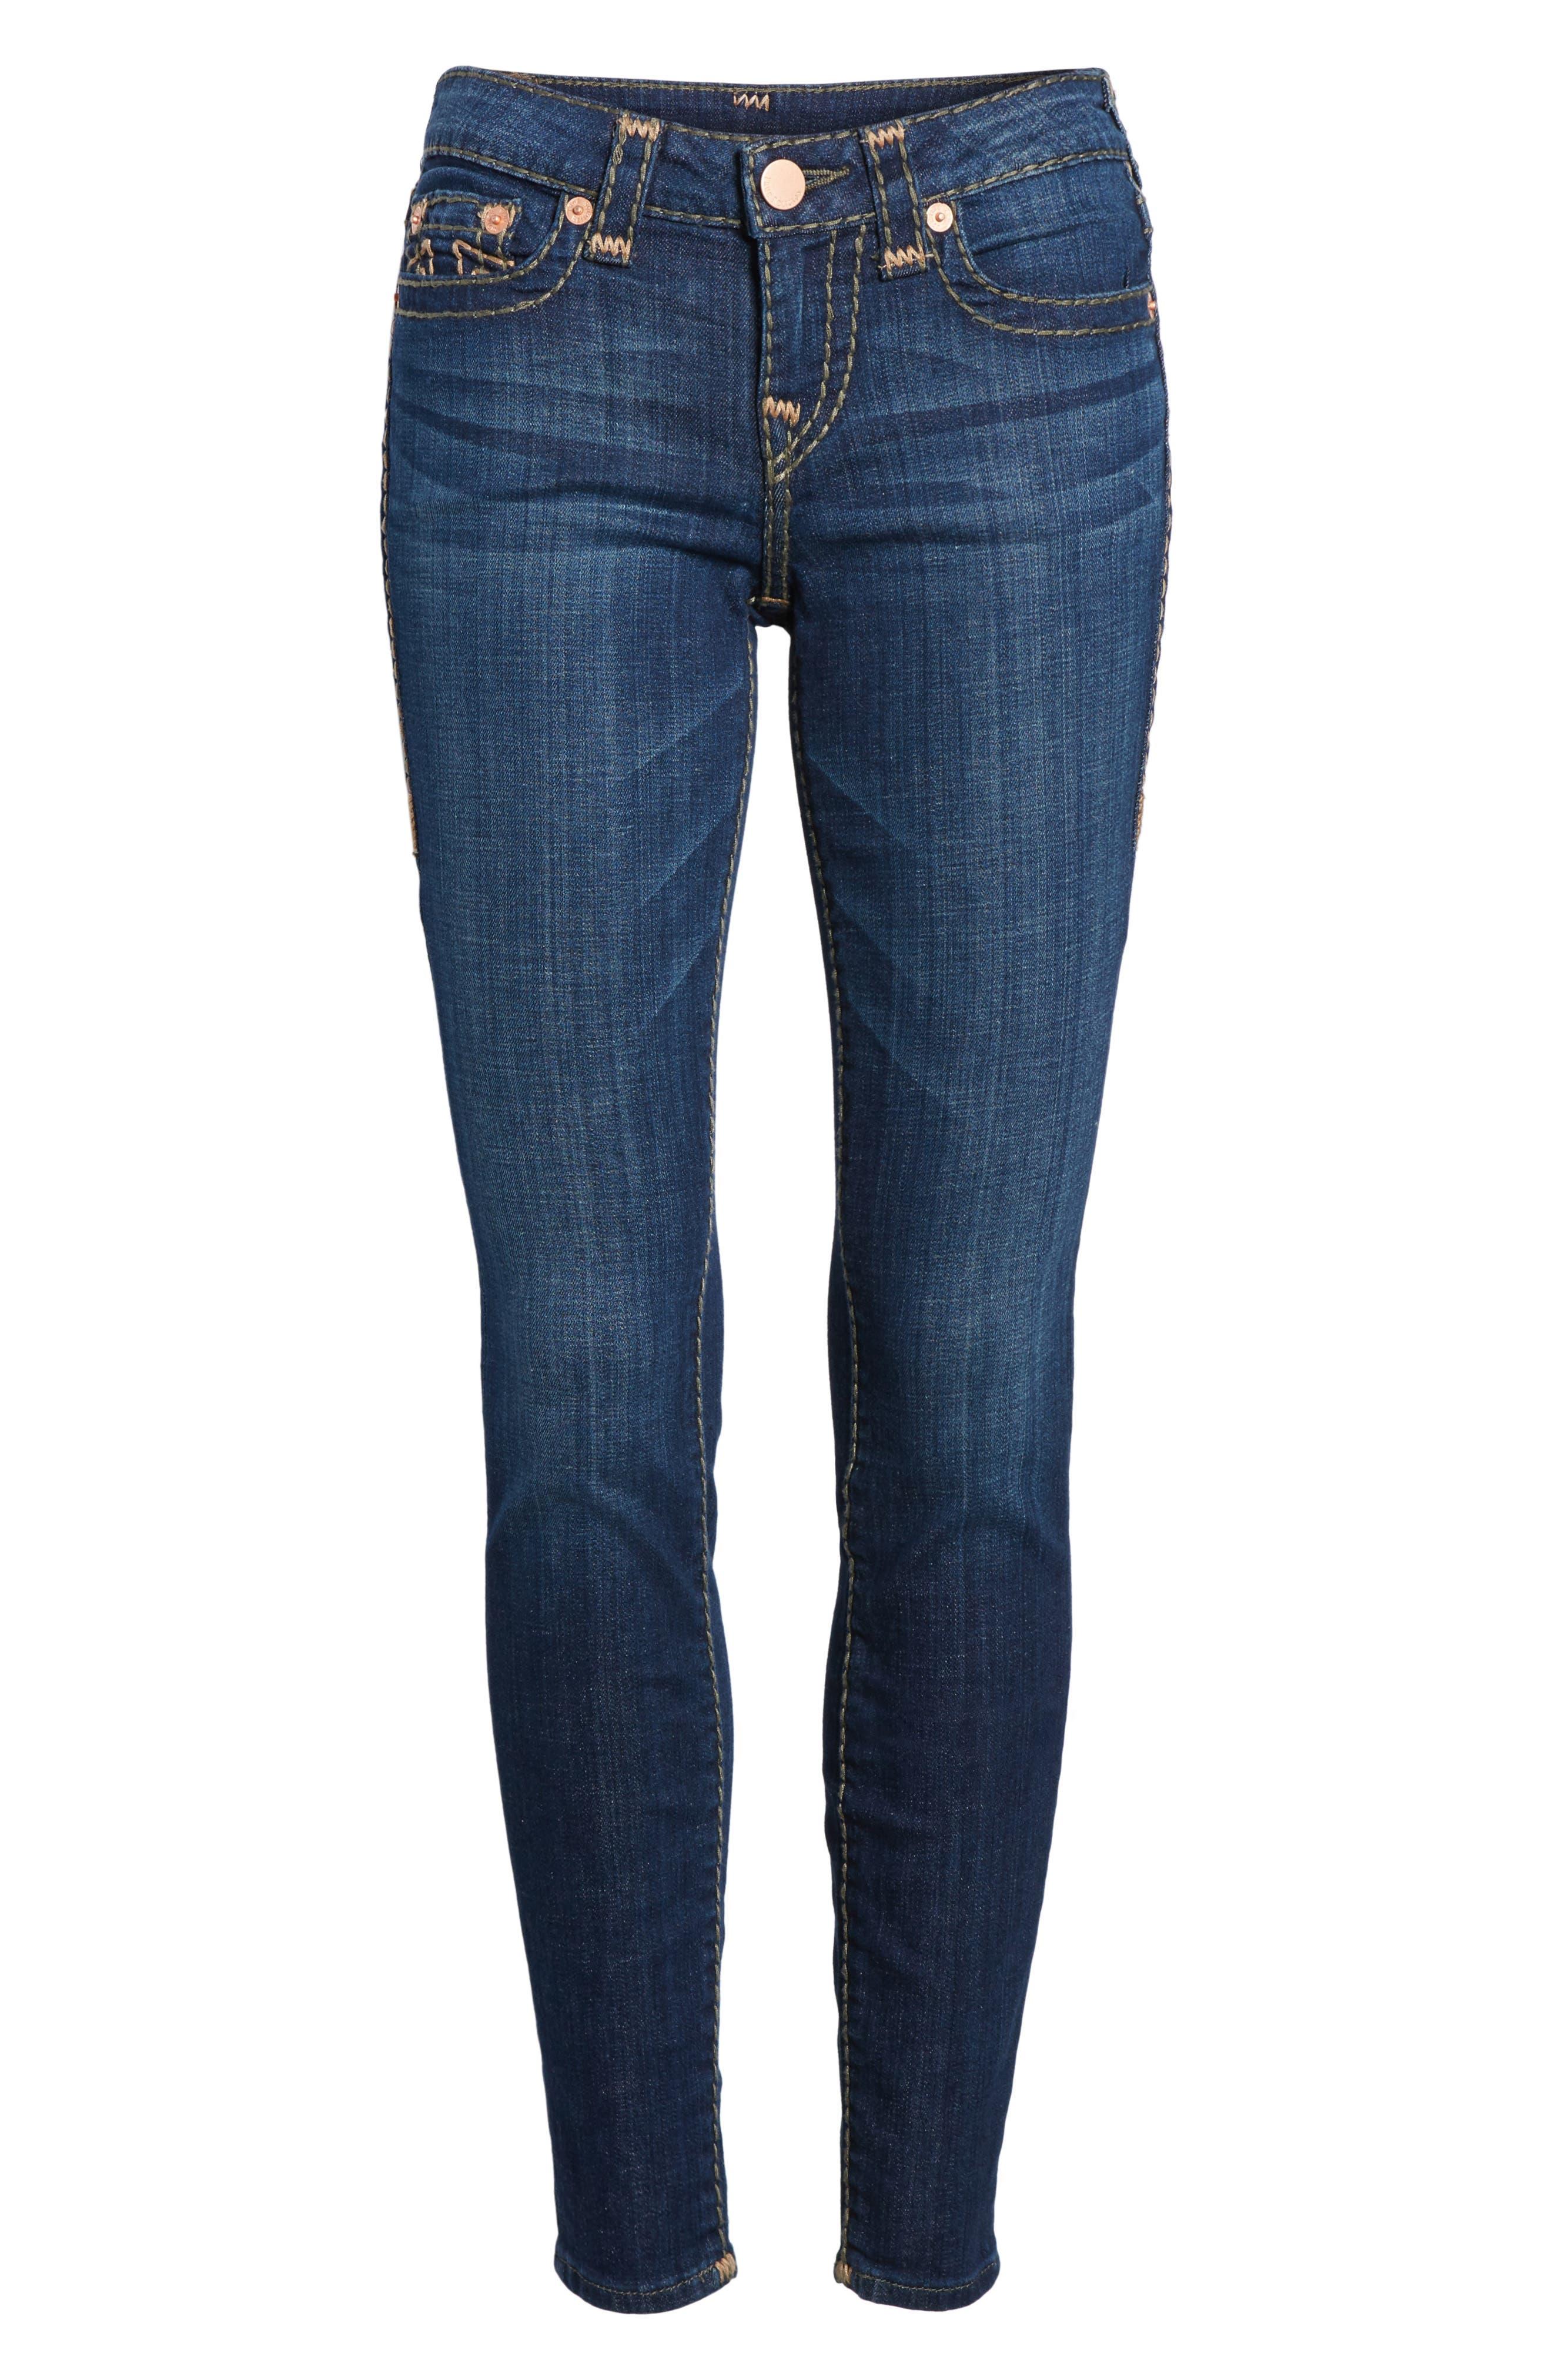 Halle Skinny Jeans,                             Alternate thumbnail 7, color,                             402